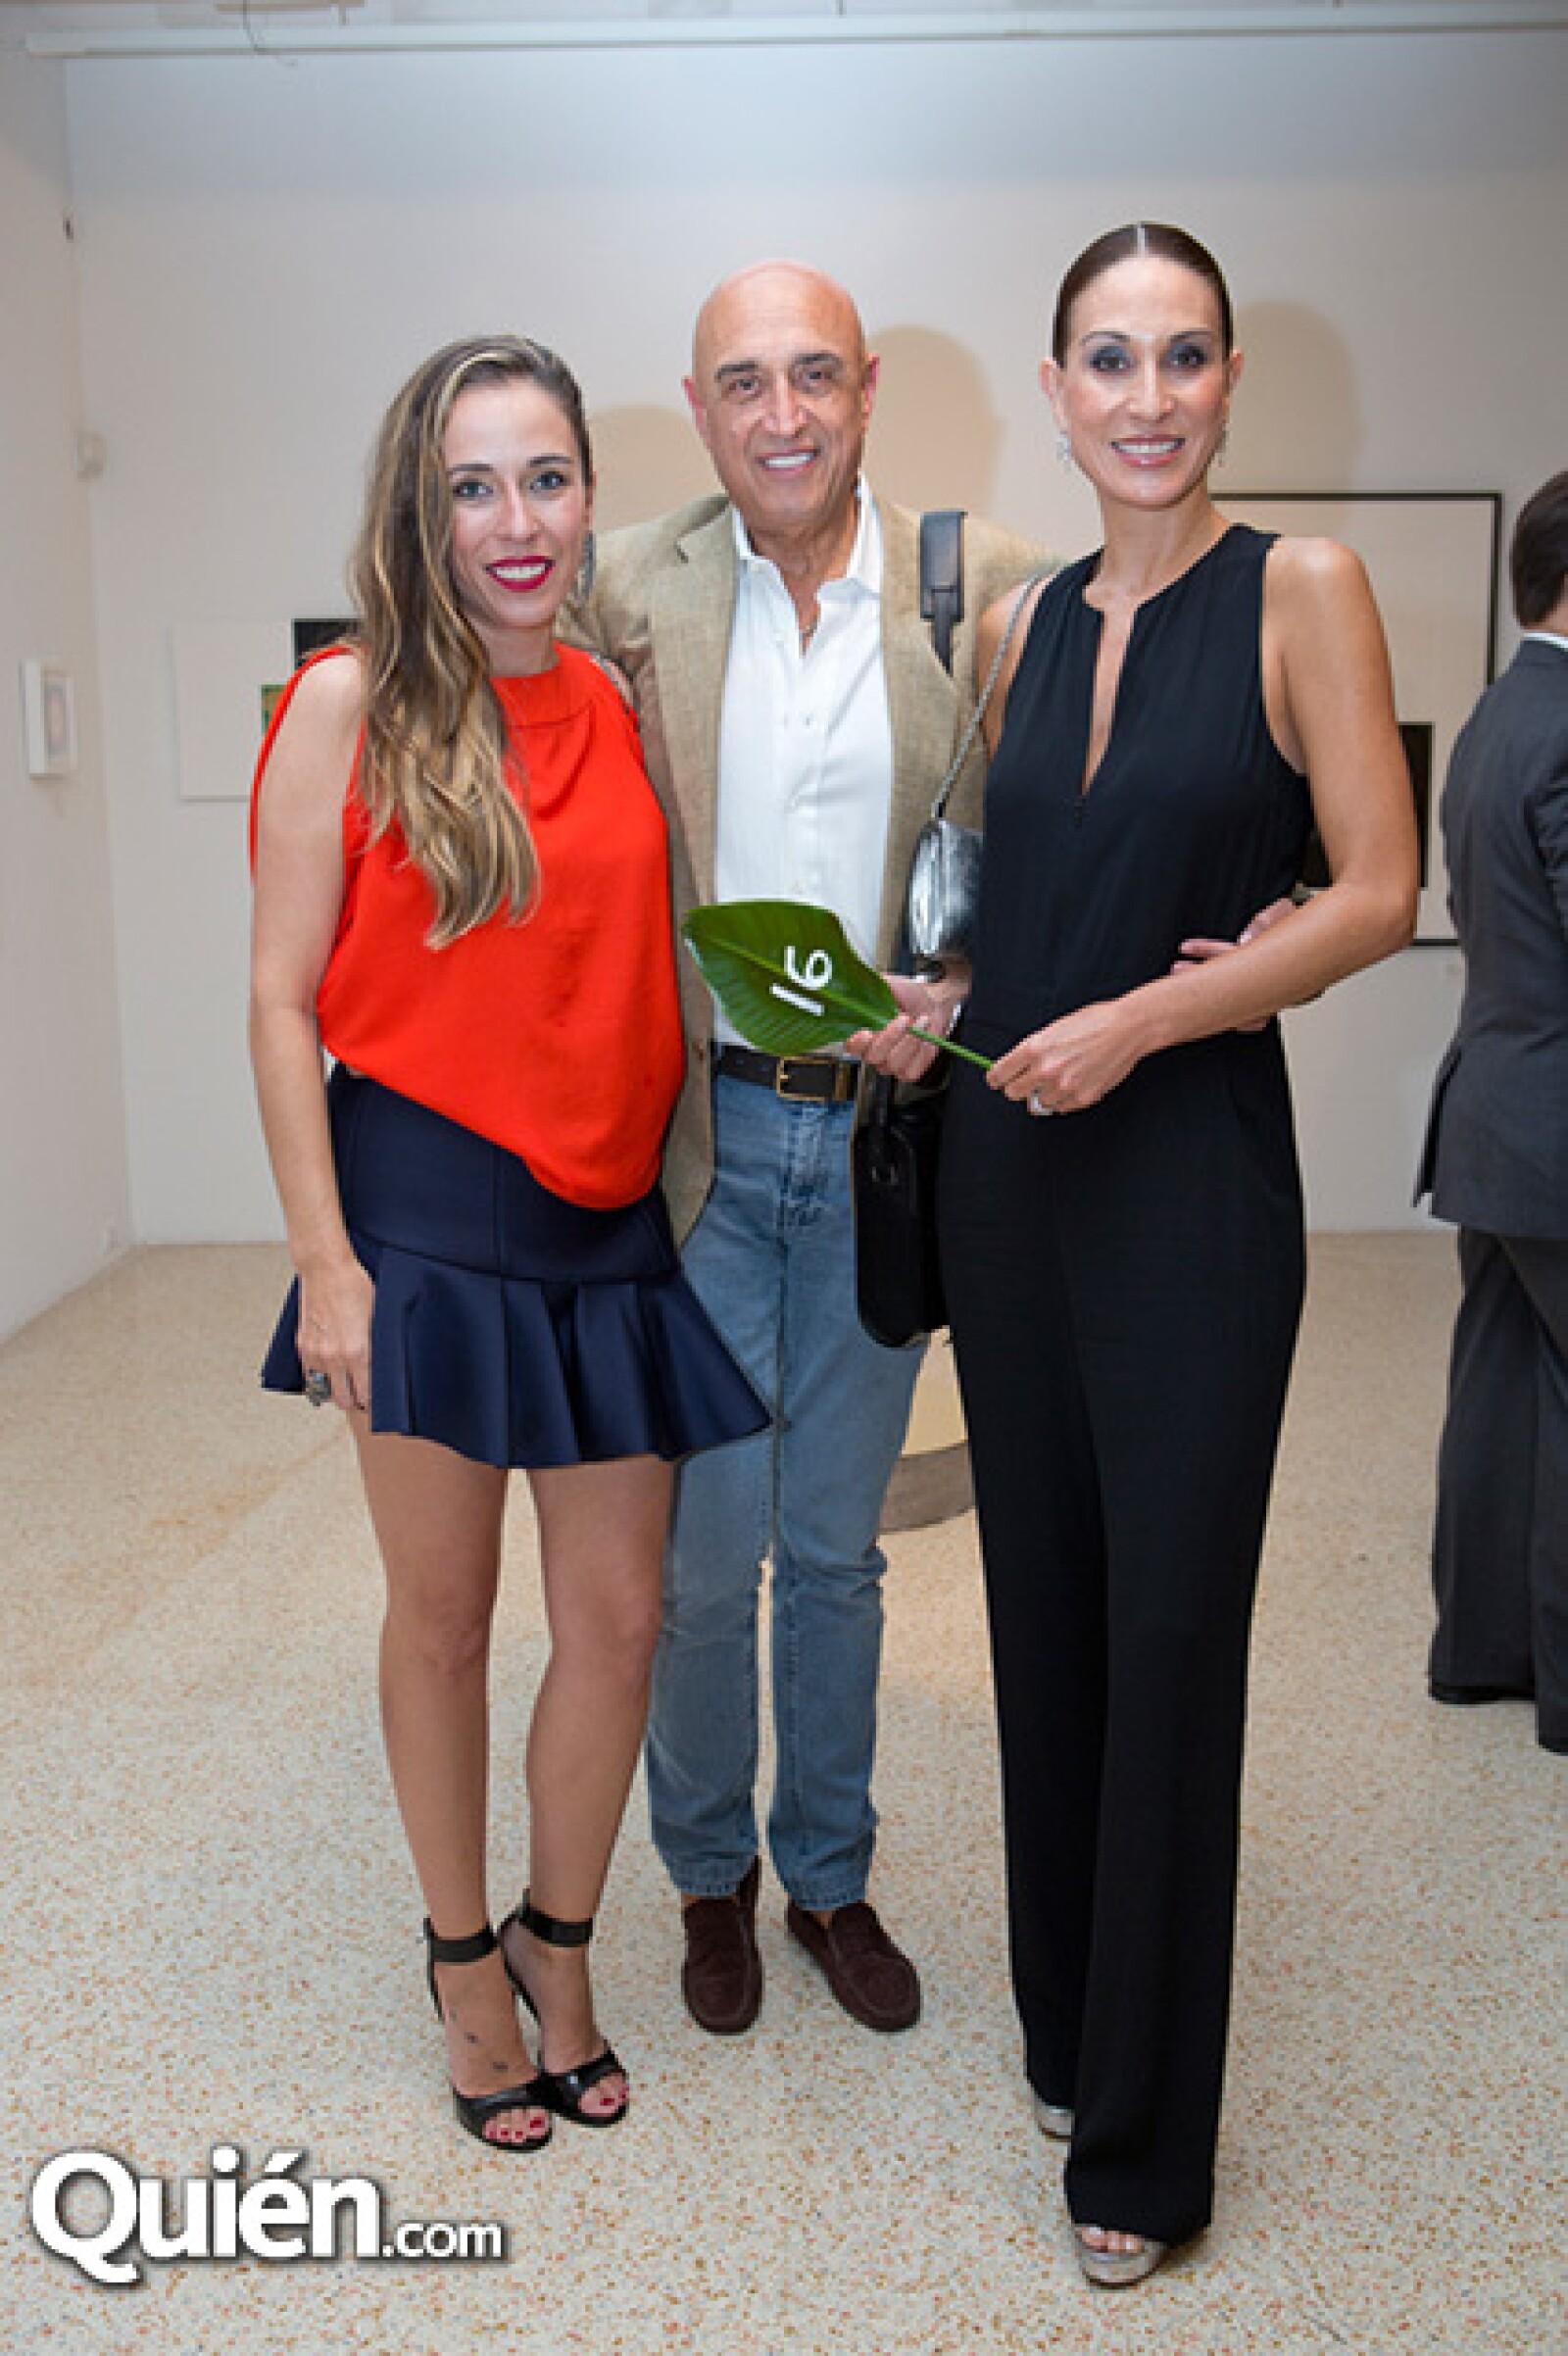 Roberta Lobeira,Pedro Torres y Roberta López Negrete